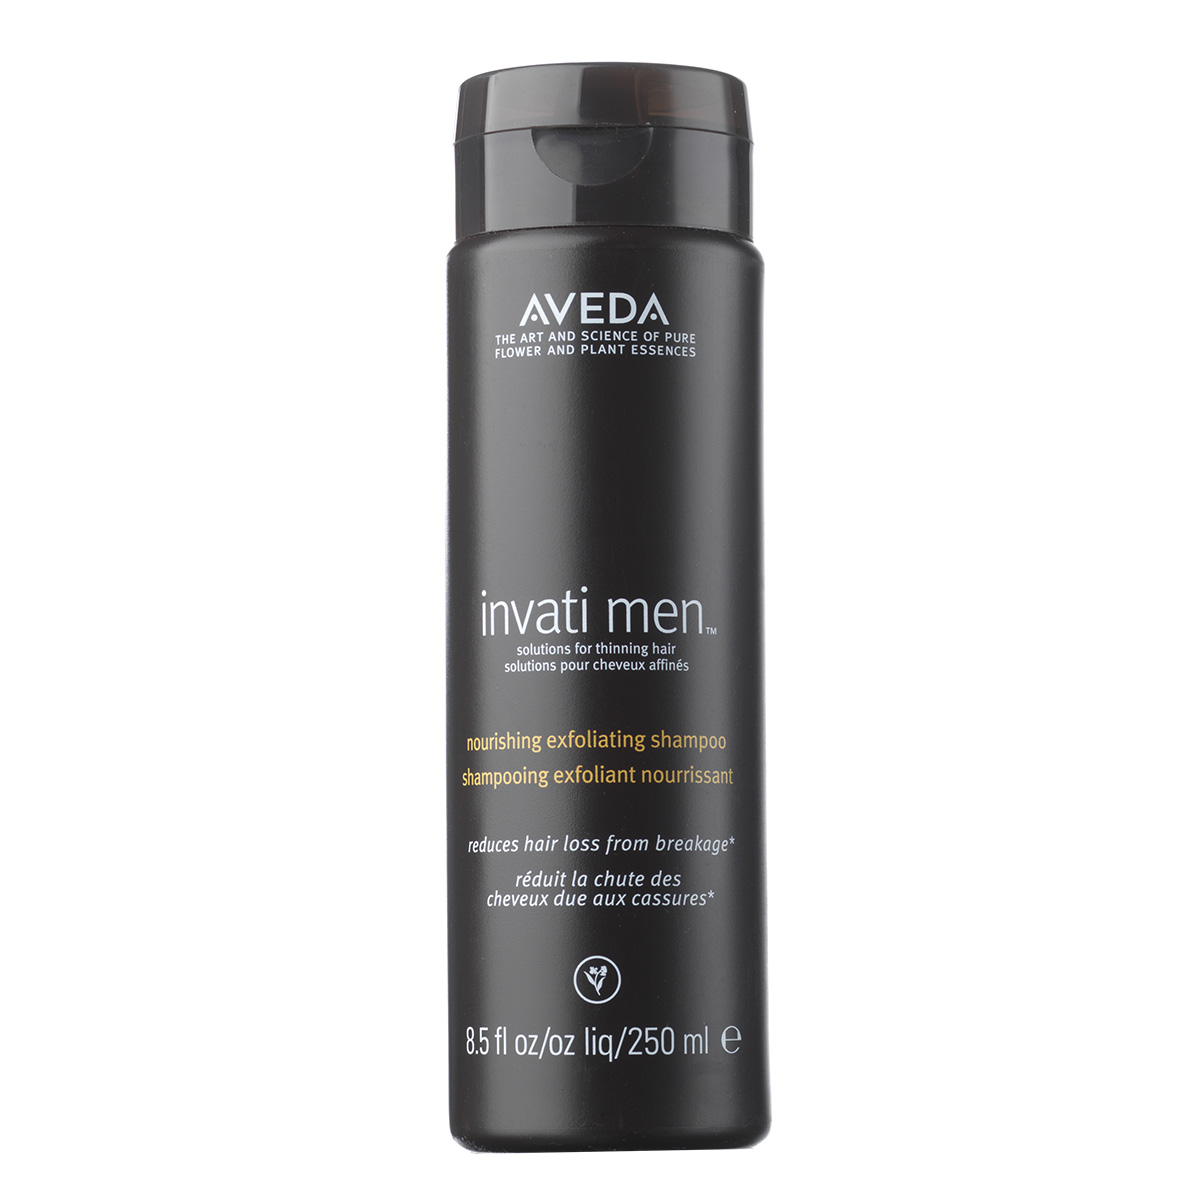 Image of   Aveda Invati Men Exfoliating Shampoo - 250 ml